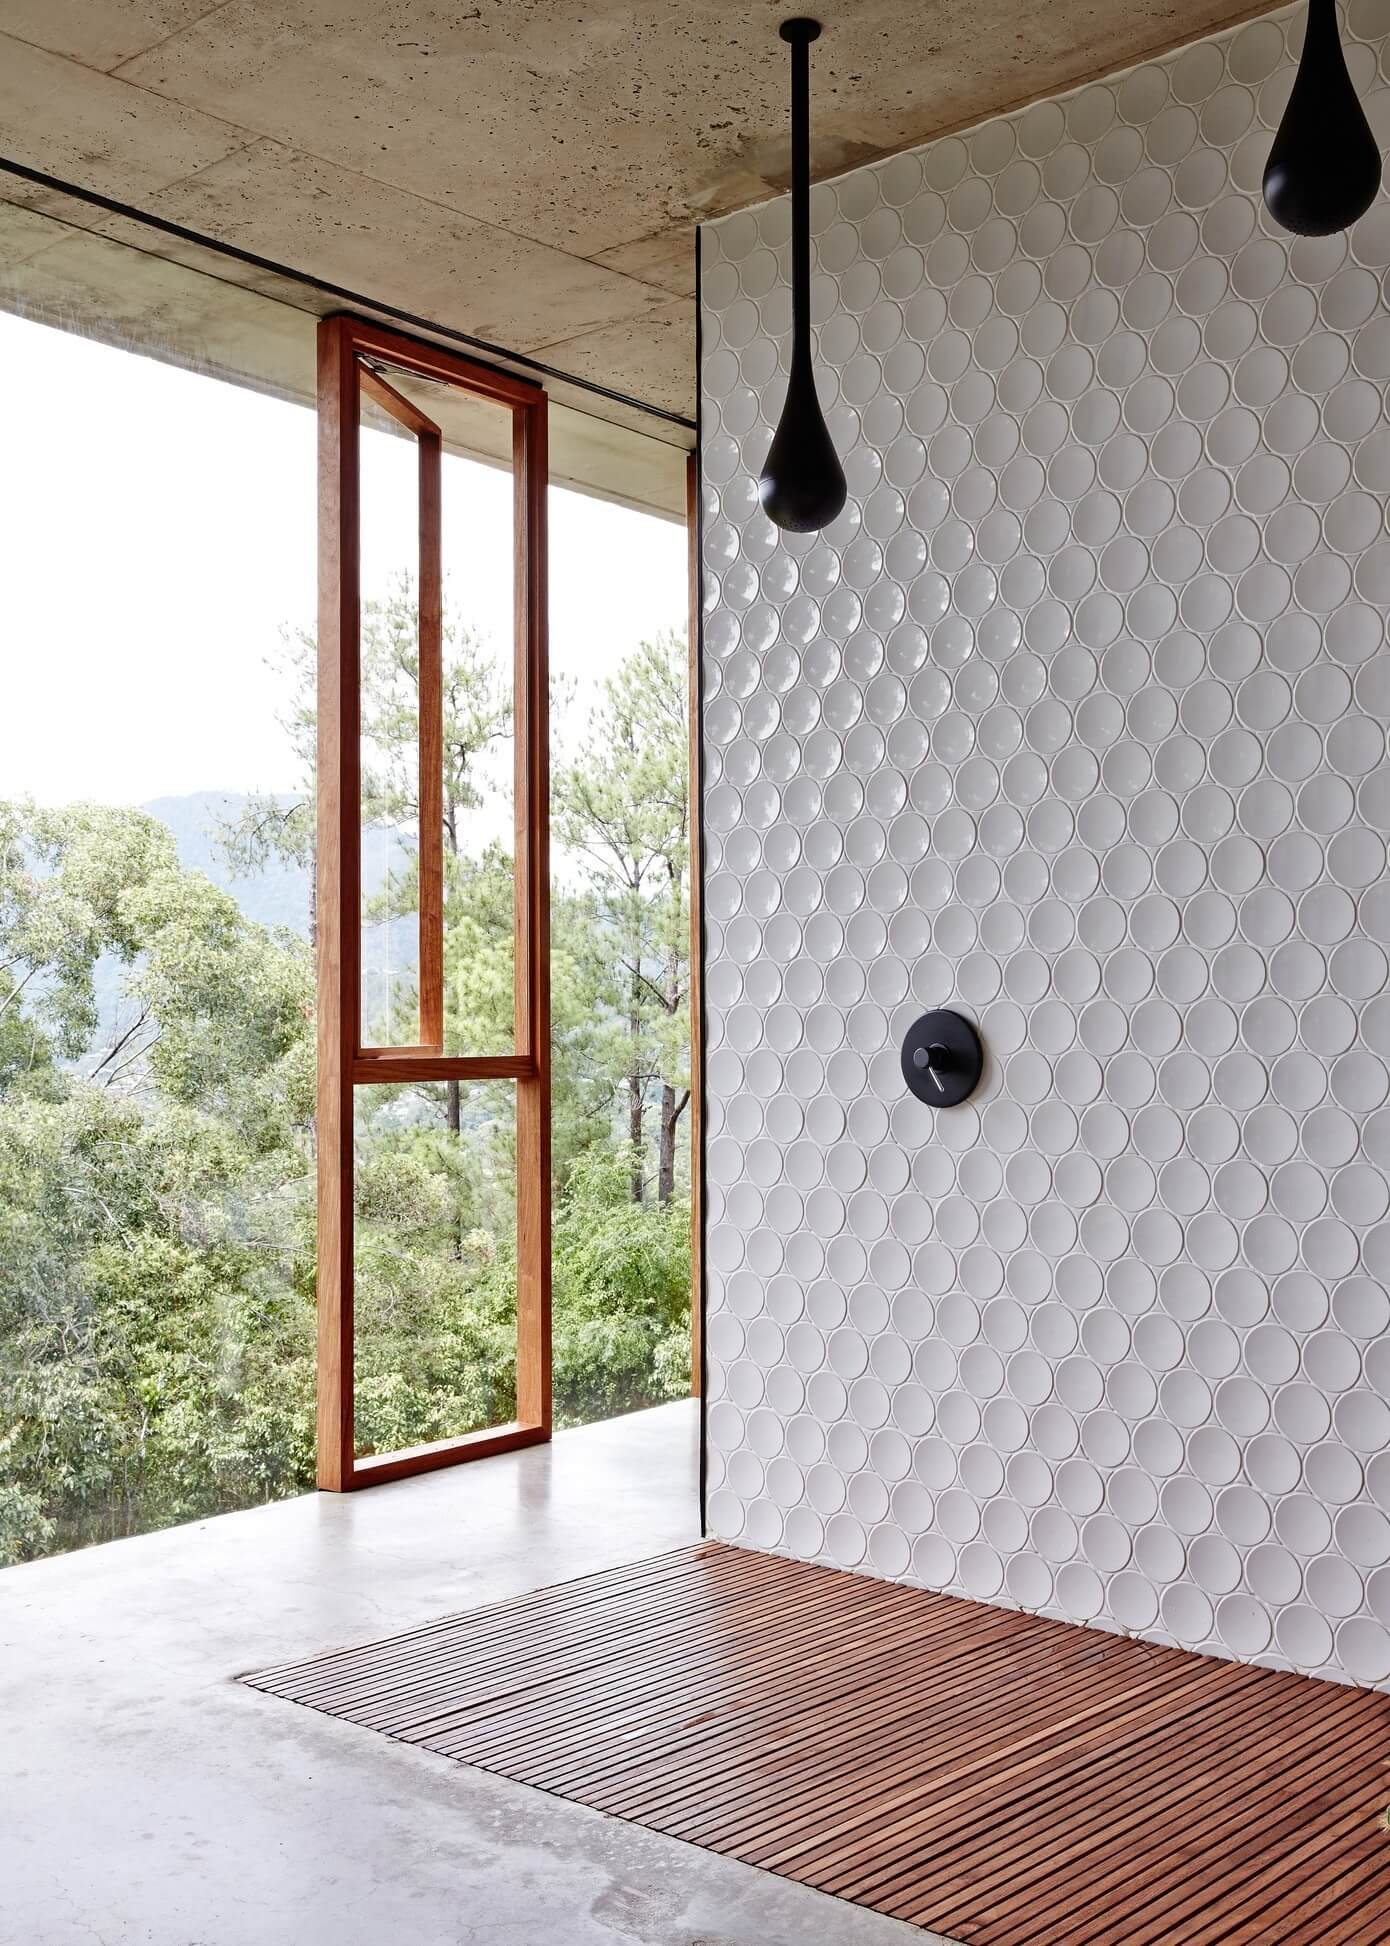 planchonella-house-jesse-bennett-architect-17